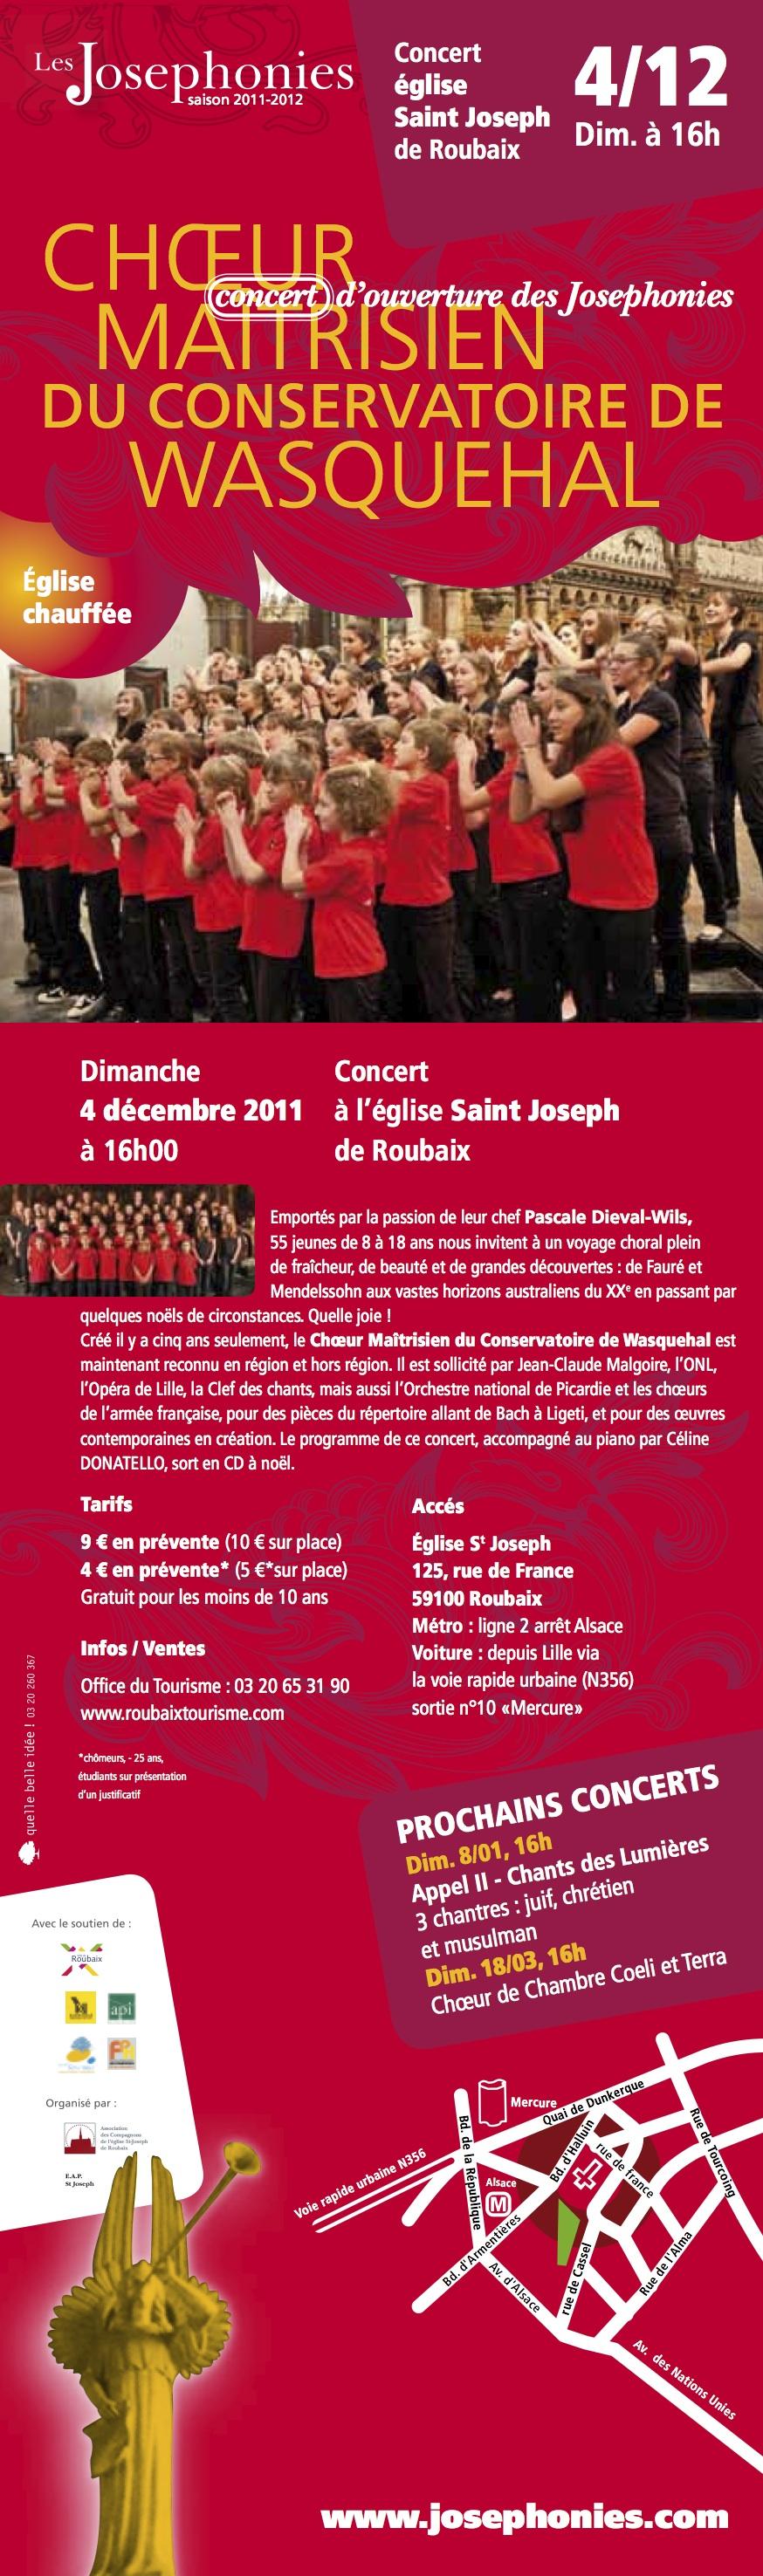 Josephonies 4 decembre 2011